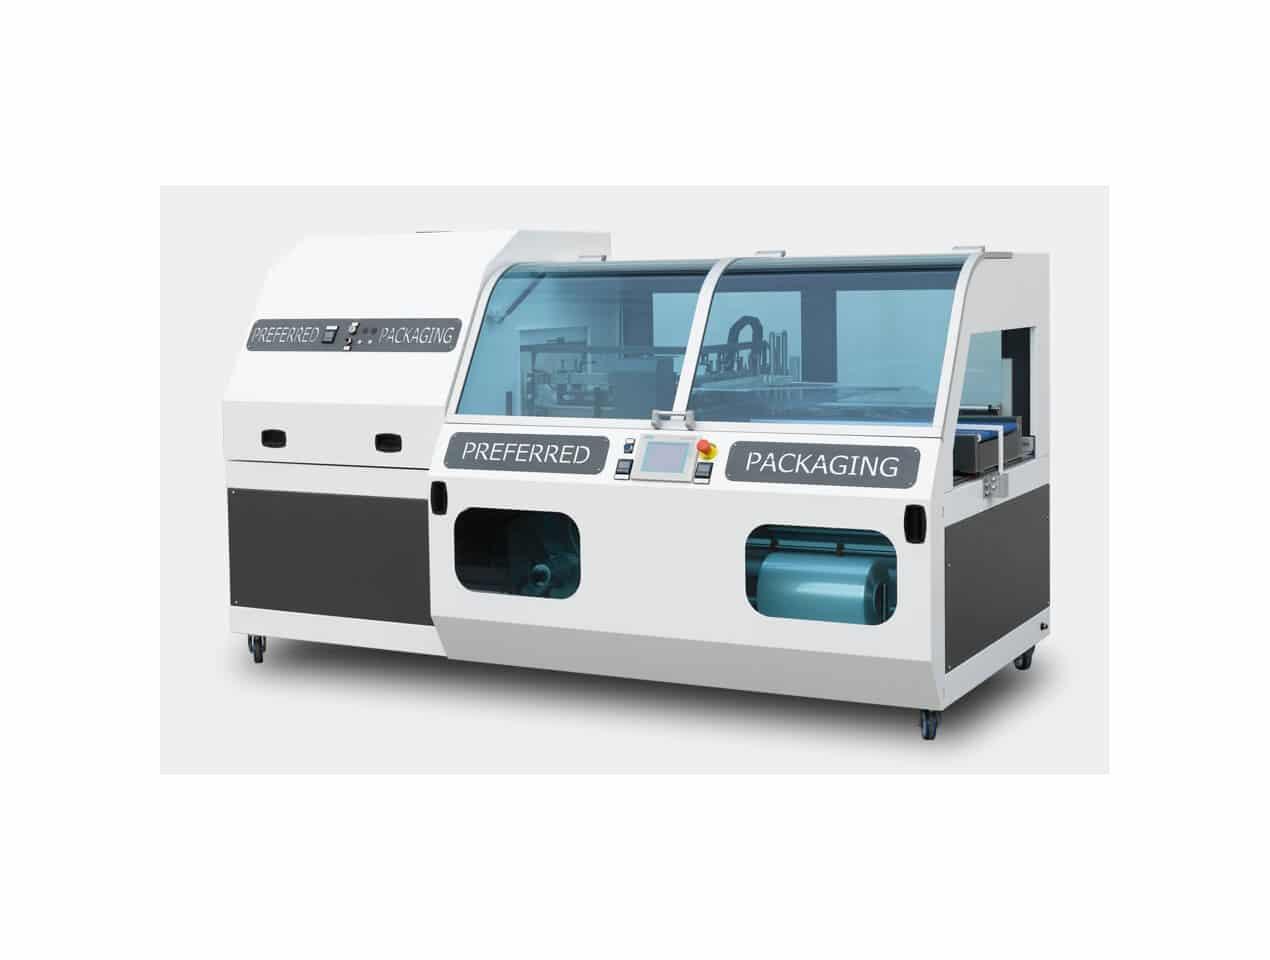 Anteprima Automatic-L-sealers-macchina-confezionatrice-automatica-Flo-DM-Pack